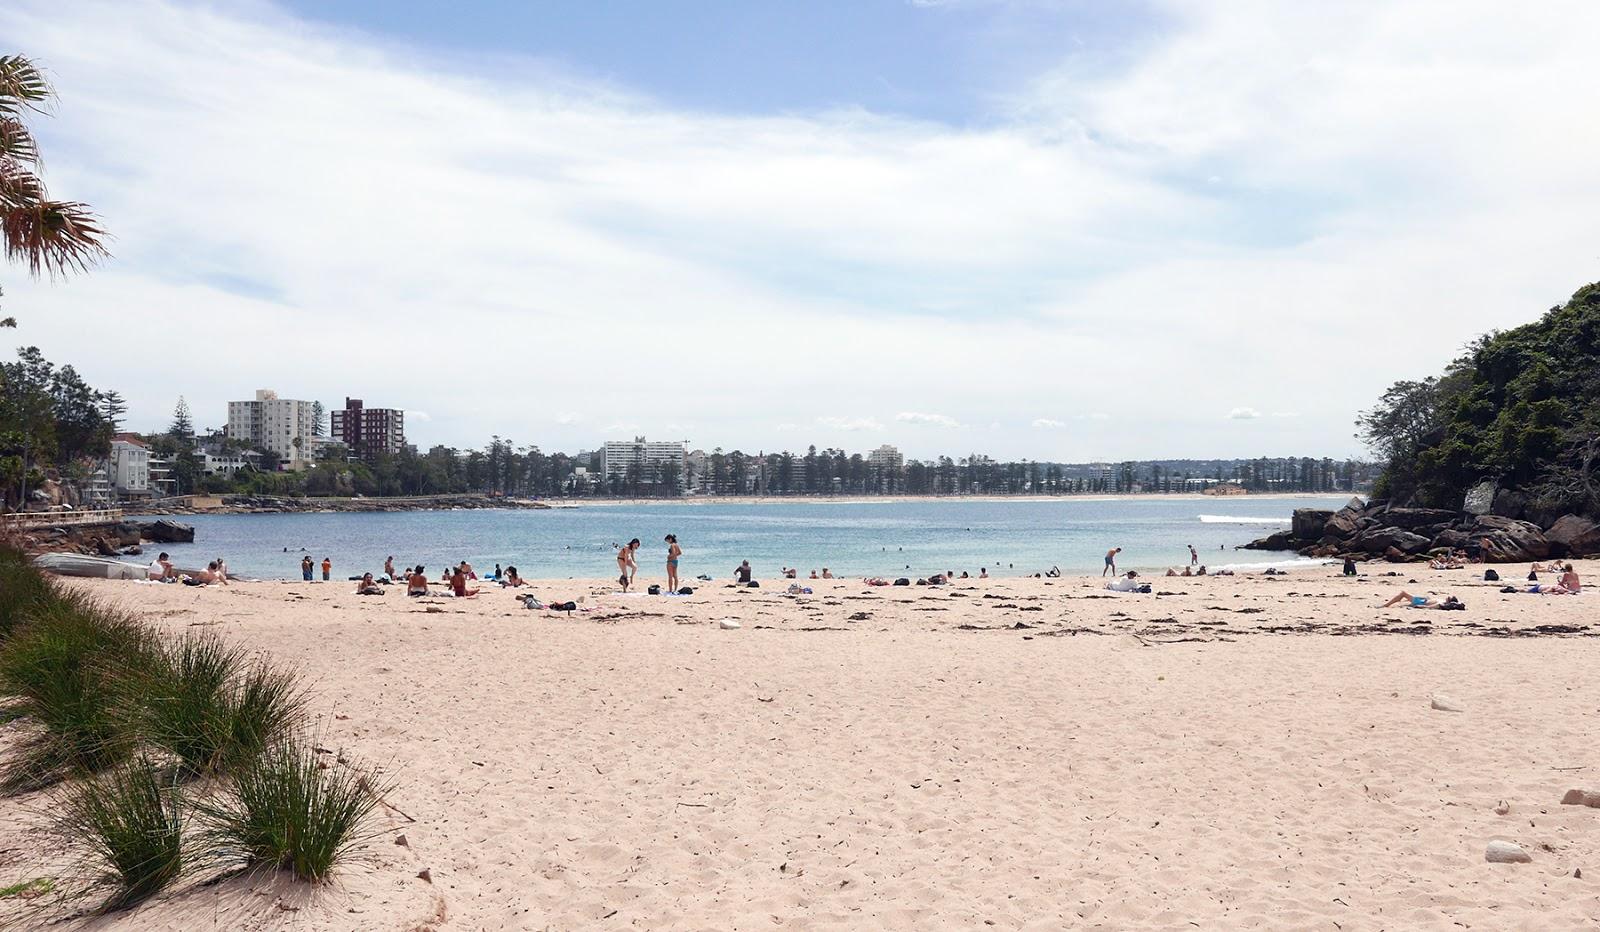 Euriental | luxury travel & style | Shelly Beach, Manly, Sydney, Australia